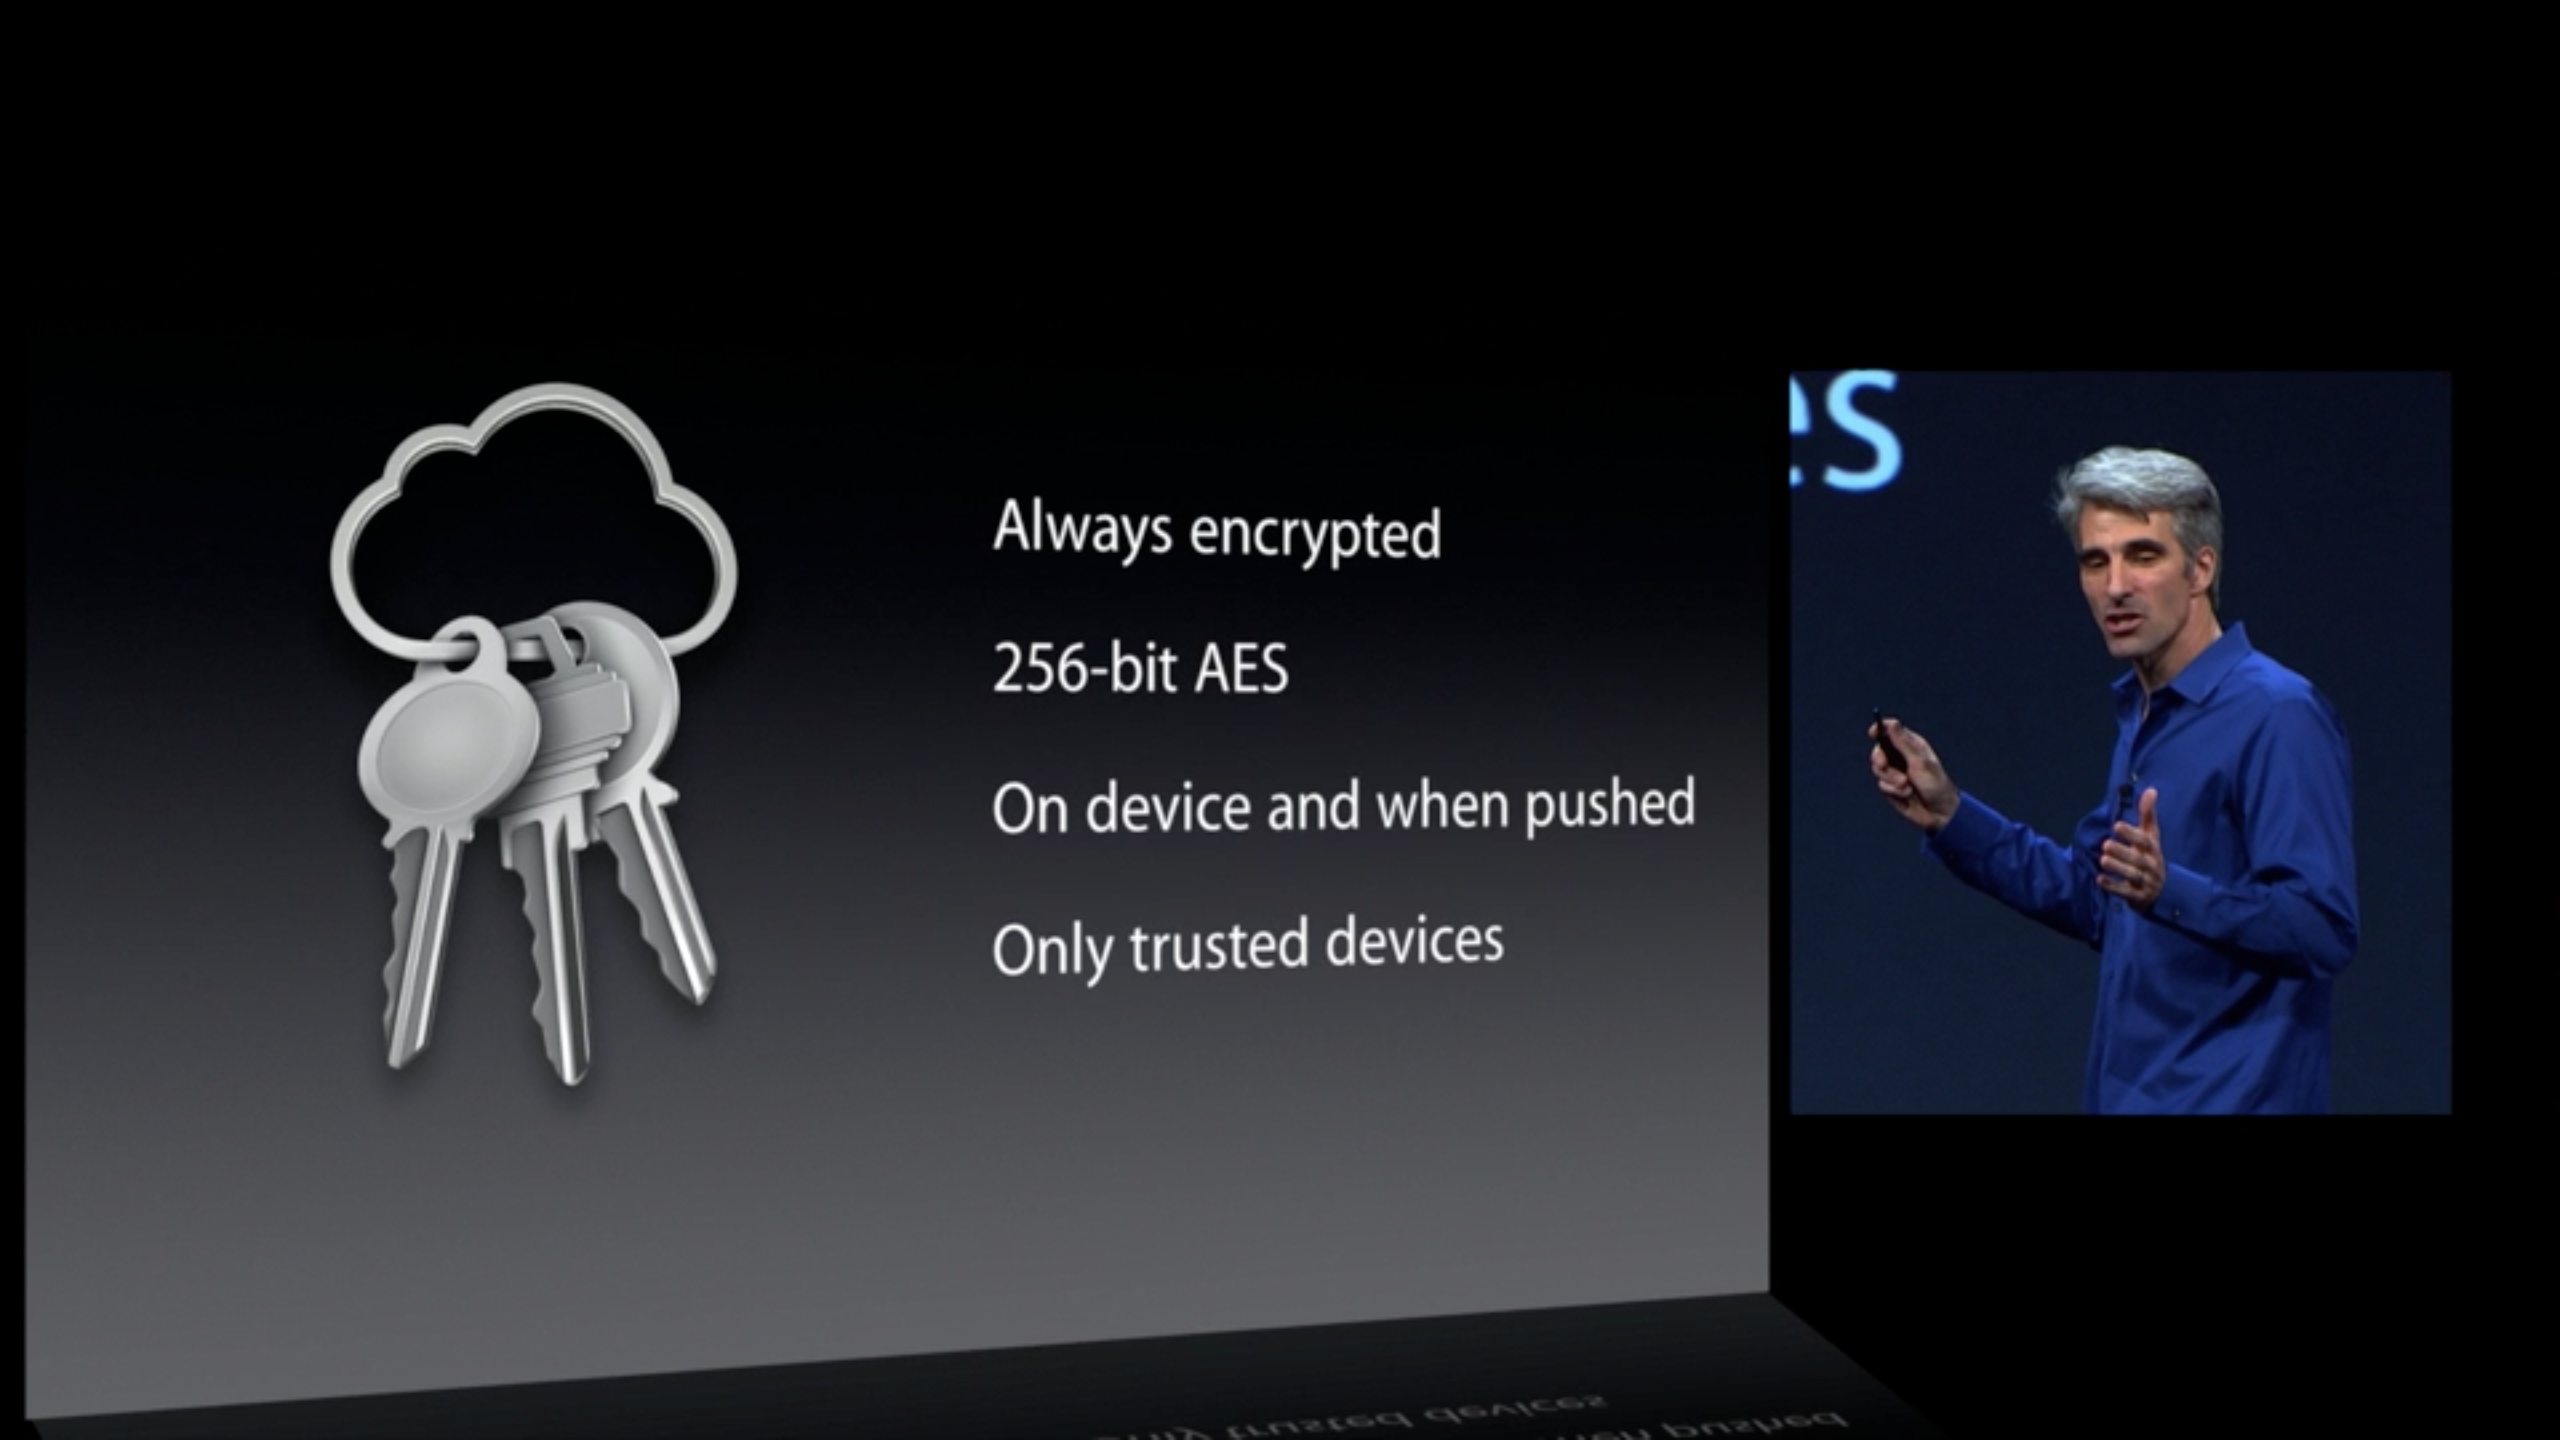 OS X Mavericks - iCloud Keychain